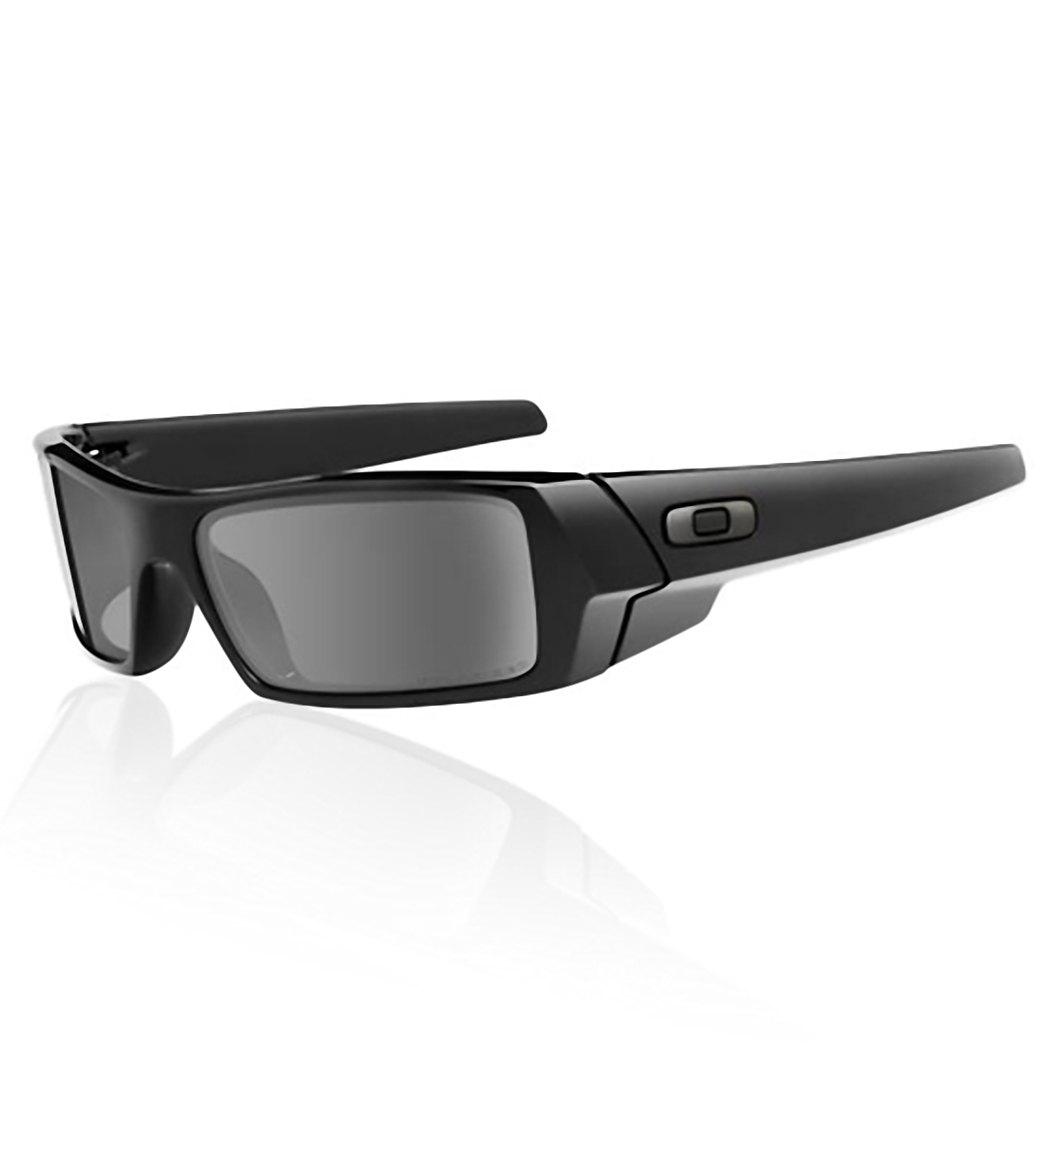 68e3bef7b9 Oakley Gascan Polarized Sunglasses at SwimOutlet.com - Free ...